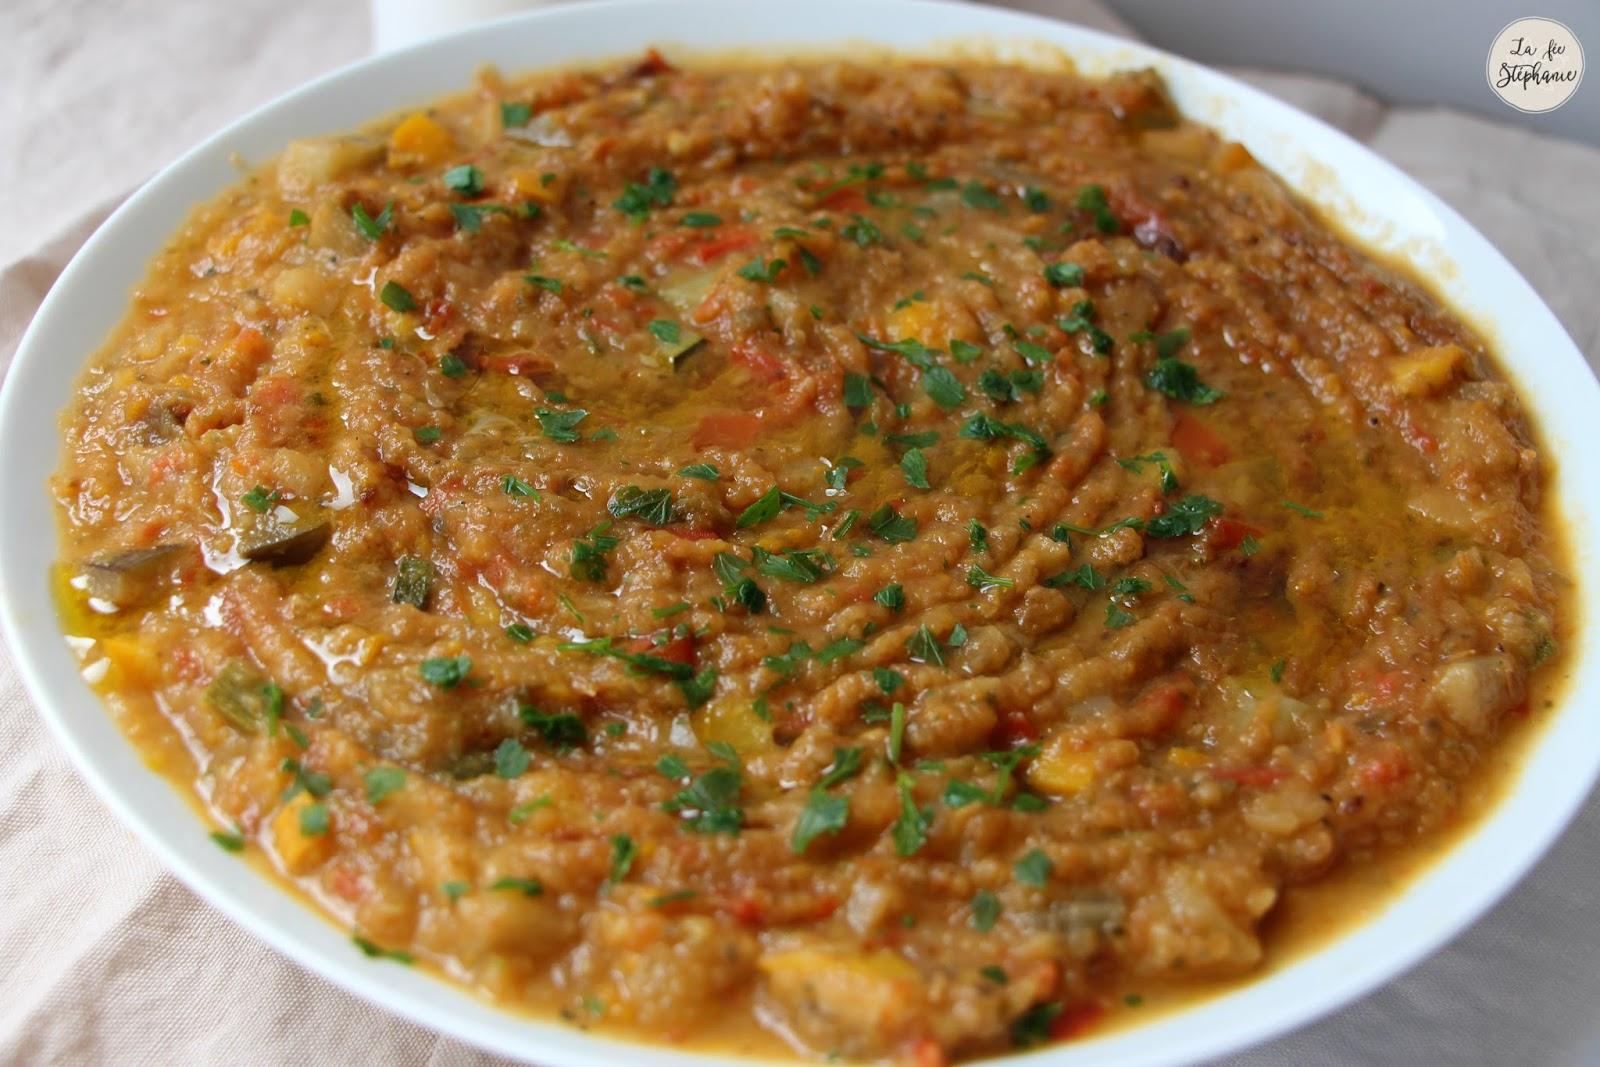 Recette de zaalouk d 39 aubergines la marocaine cuisson - Cuisiner l aubergine facile ...